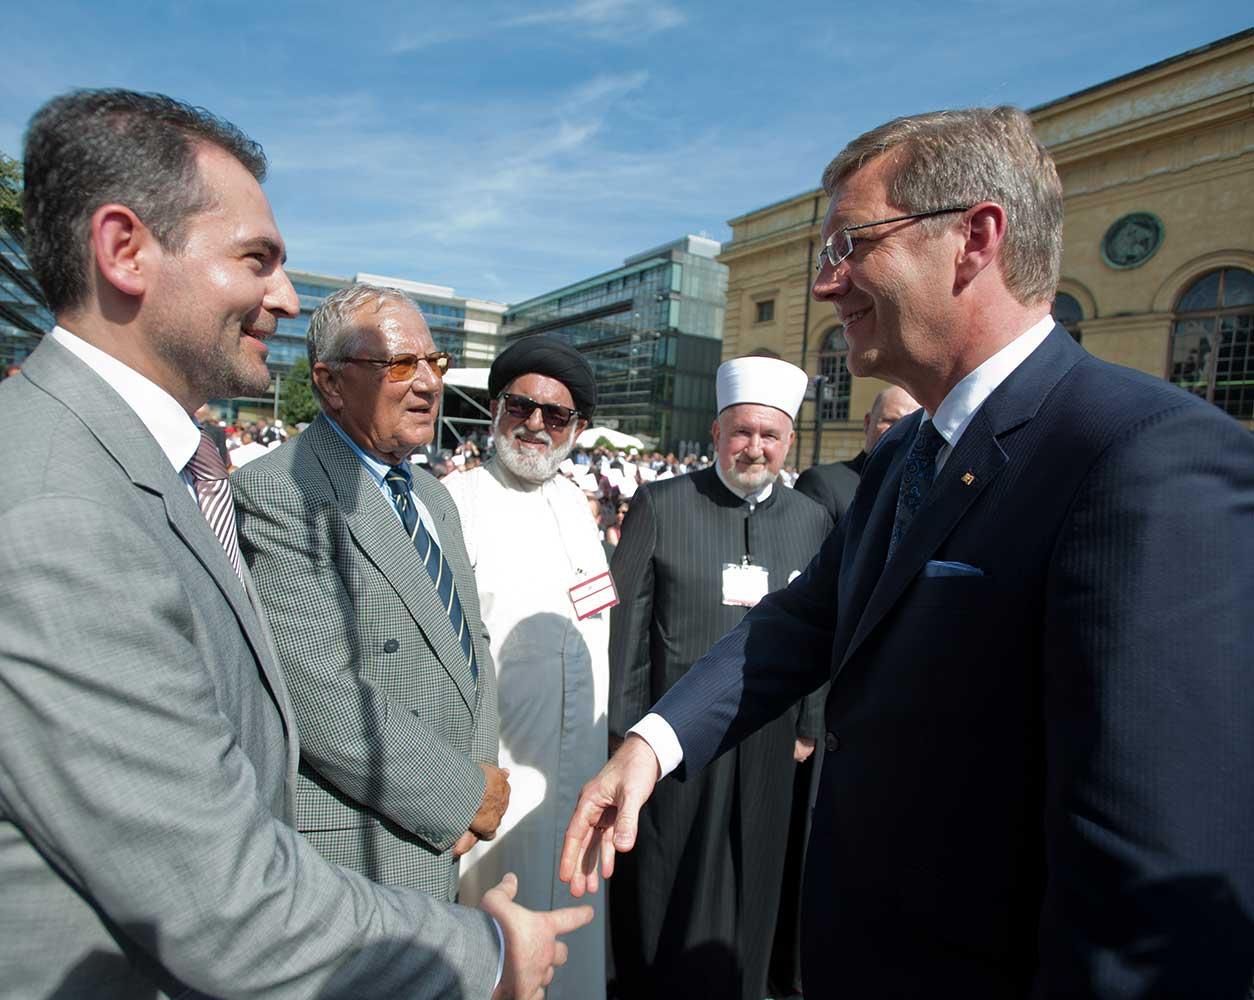 Imam Idriz und Christian Wulff